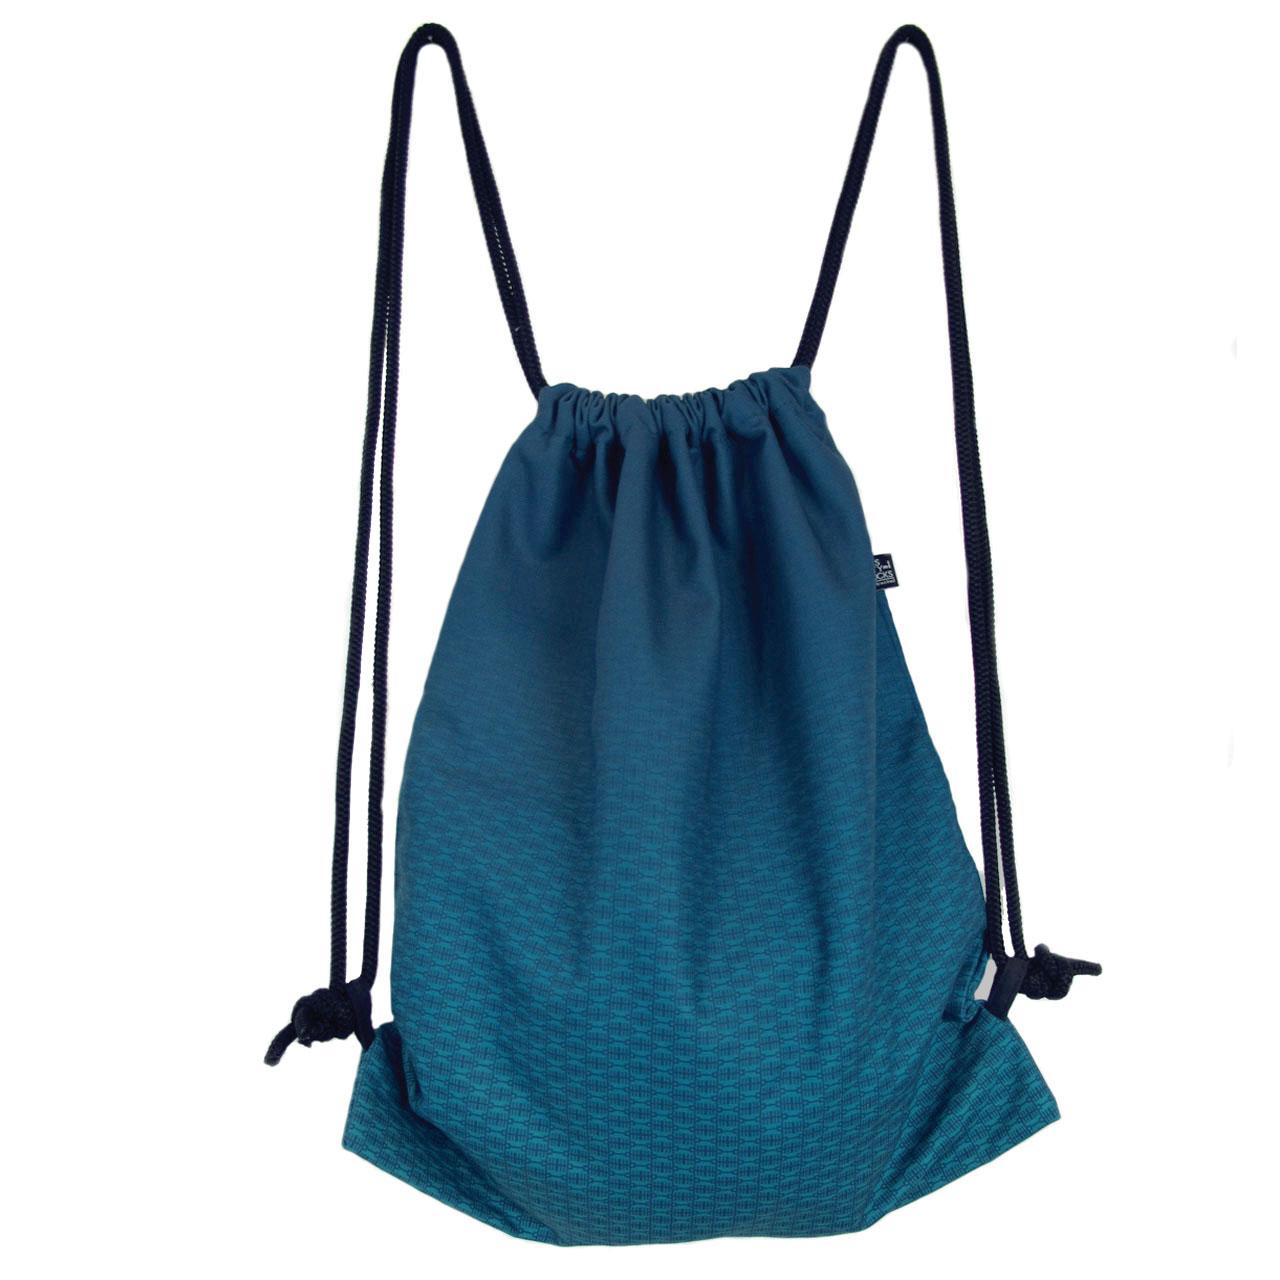 Rucksack/Gymbag Allover Brandenburger Tor blau mint